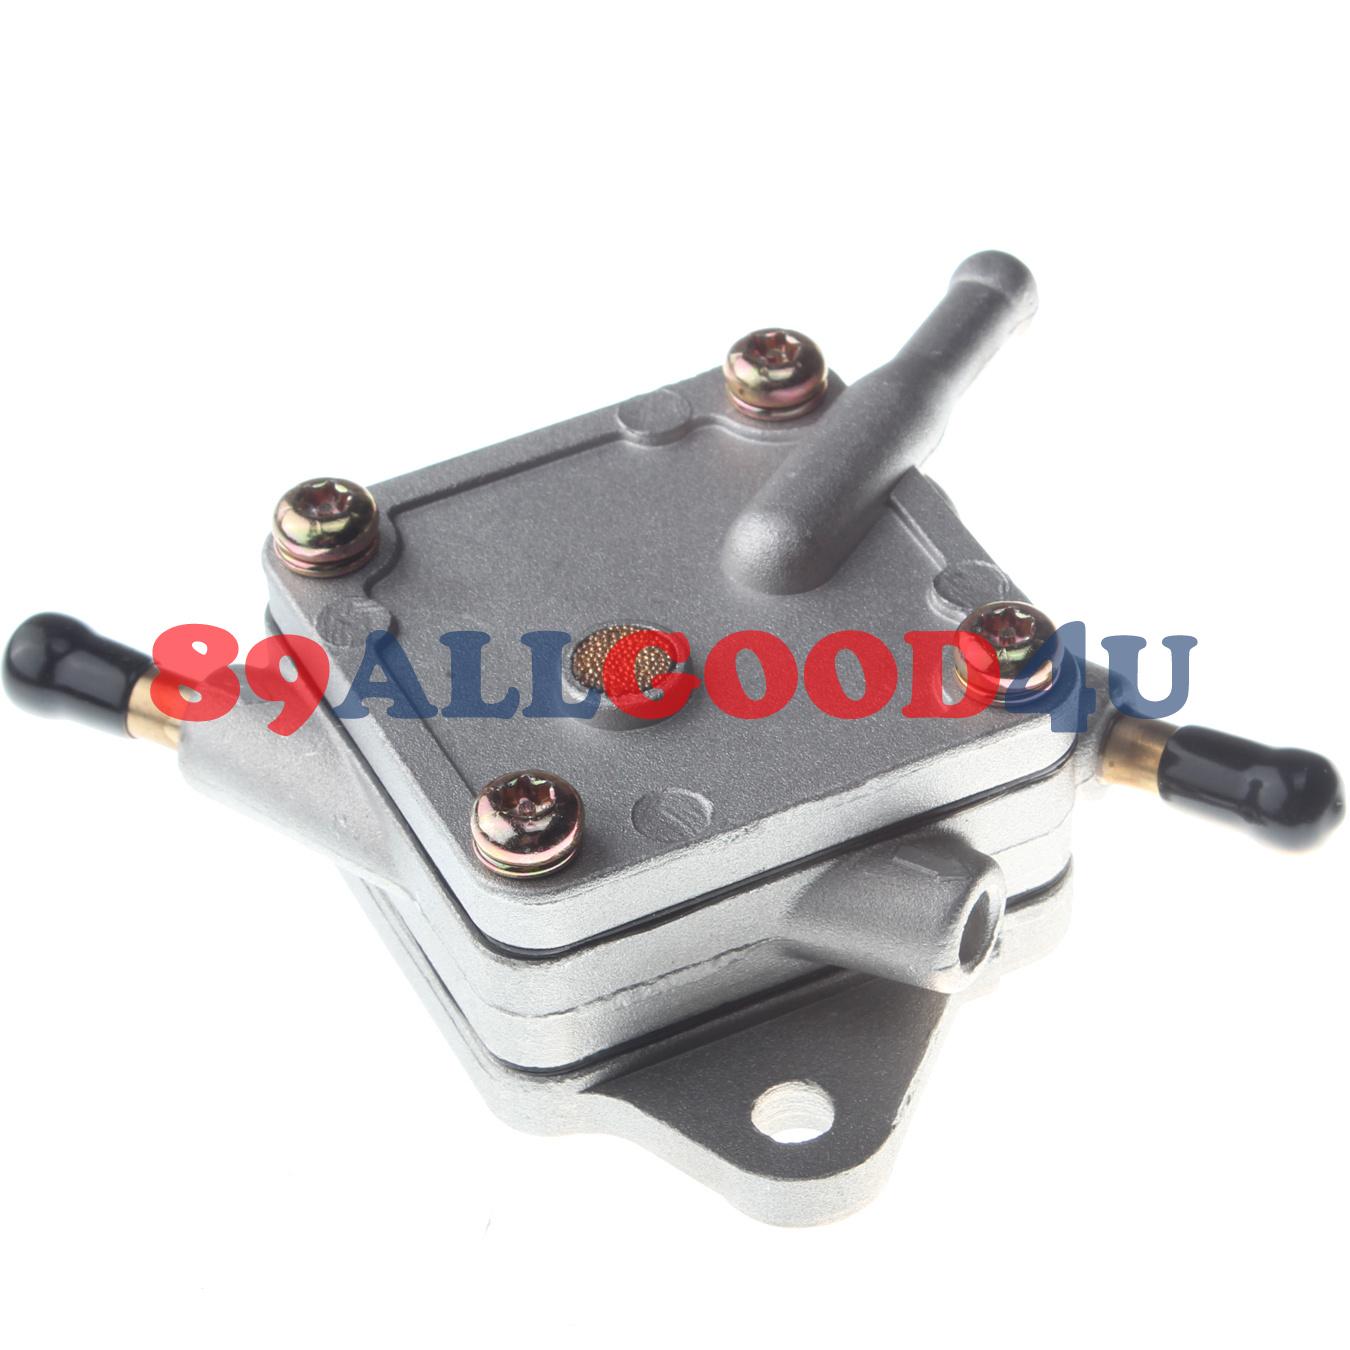 Details about New Fuel Pump for EZGO Golf Cart TXT & Medalist ('94-UP)  295/350cc Robin Engine